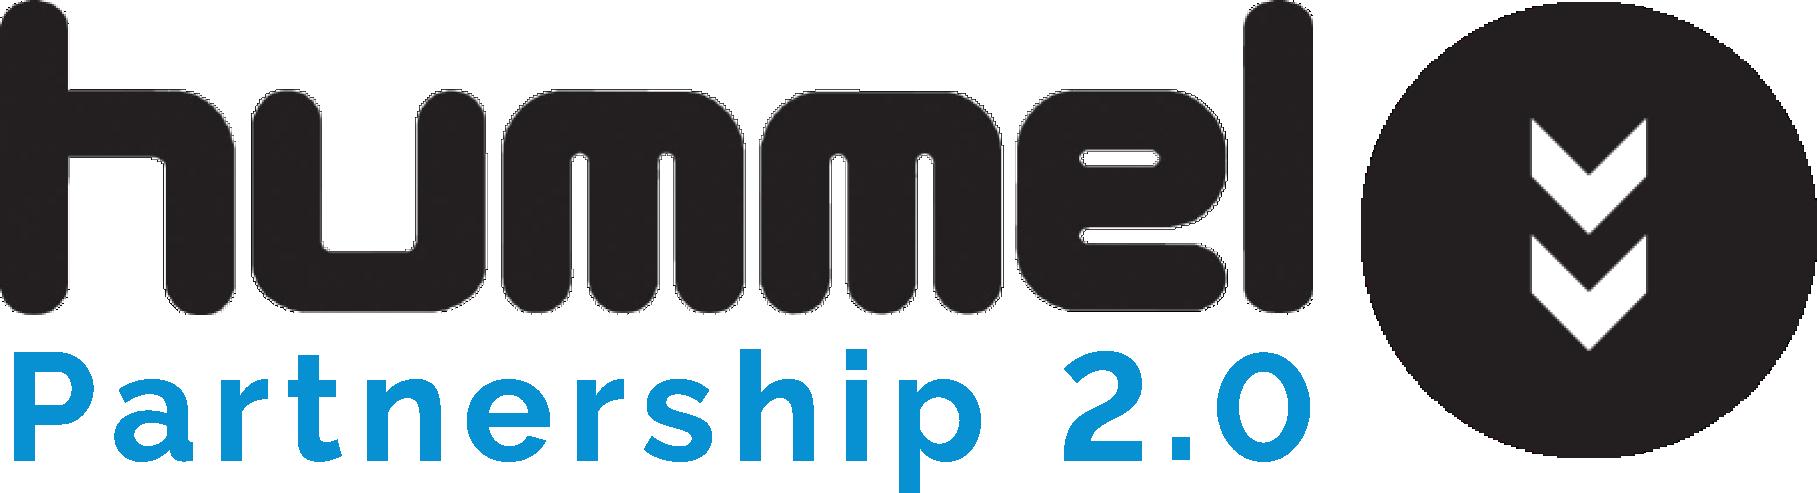 Hummel Partnership 2.0 Xcelsior